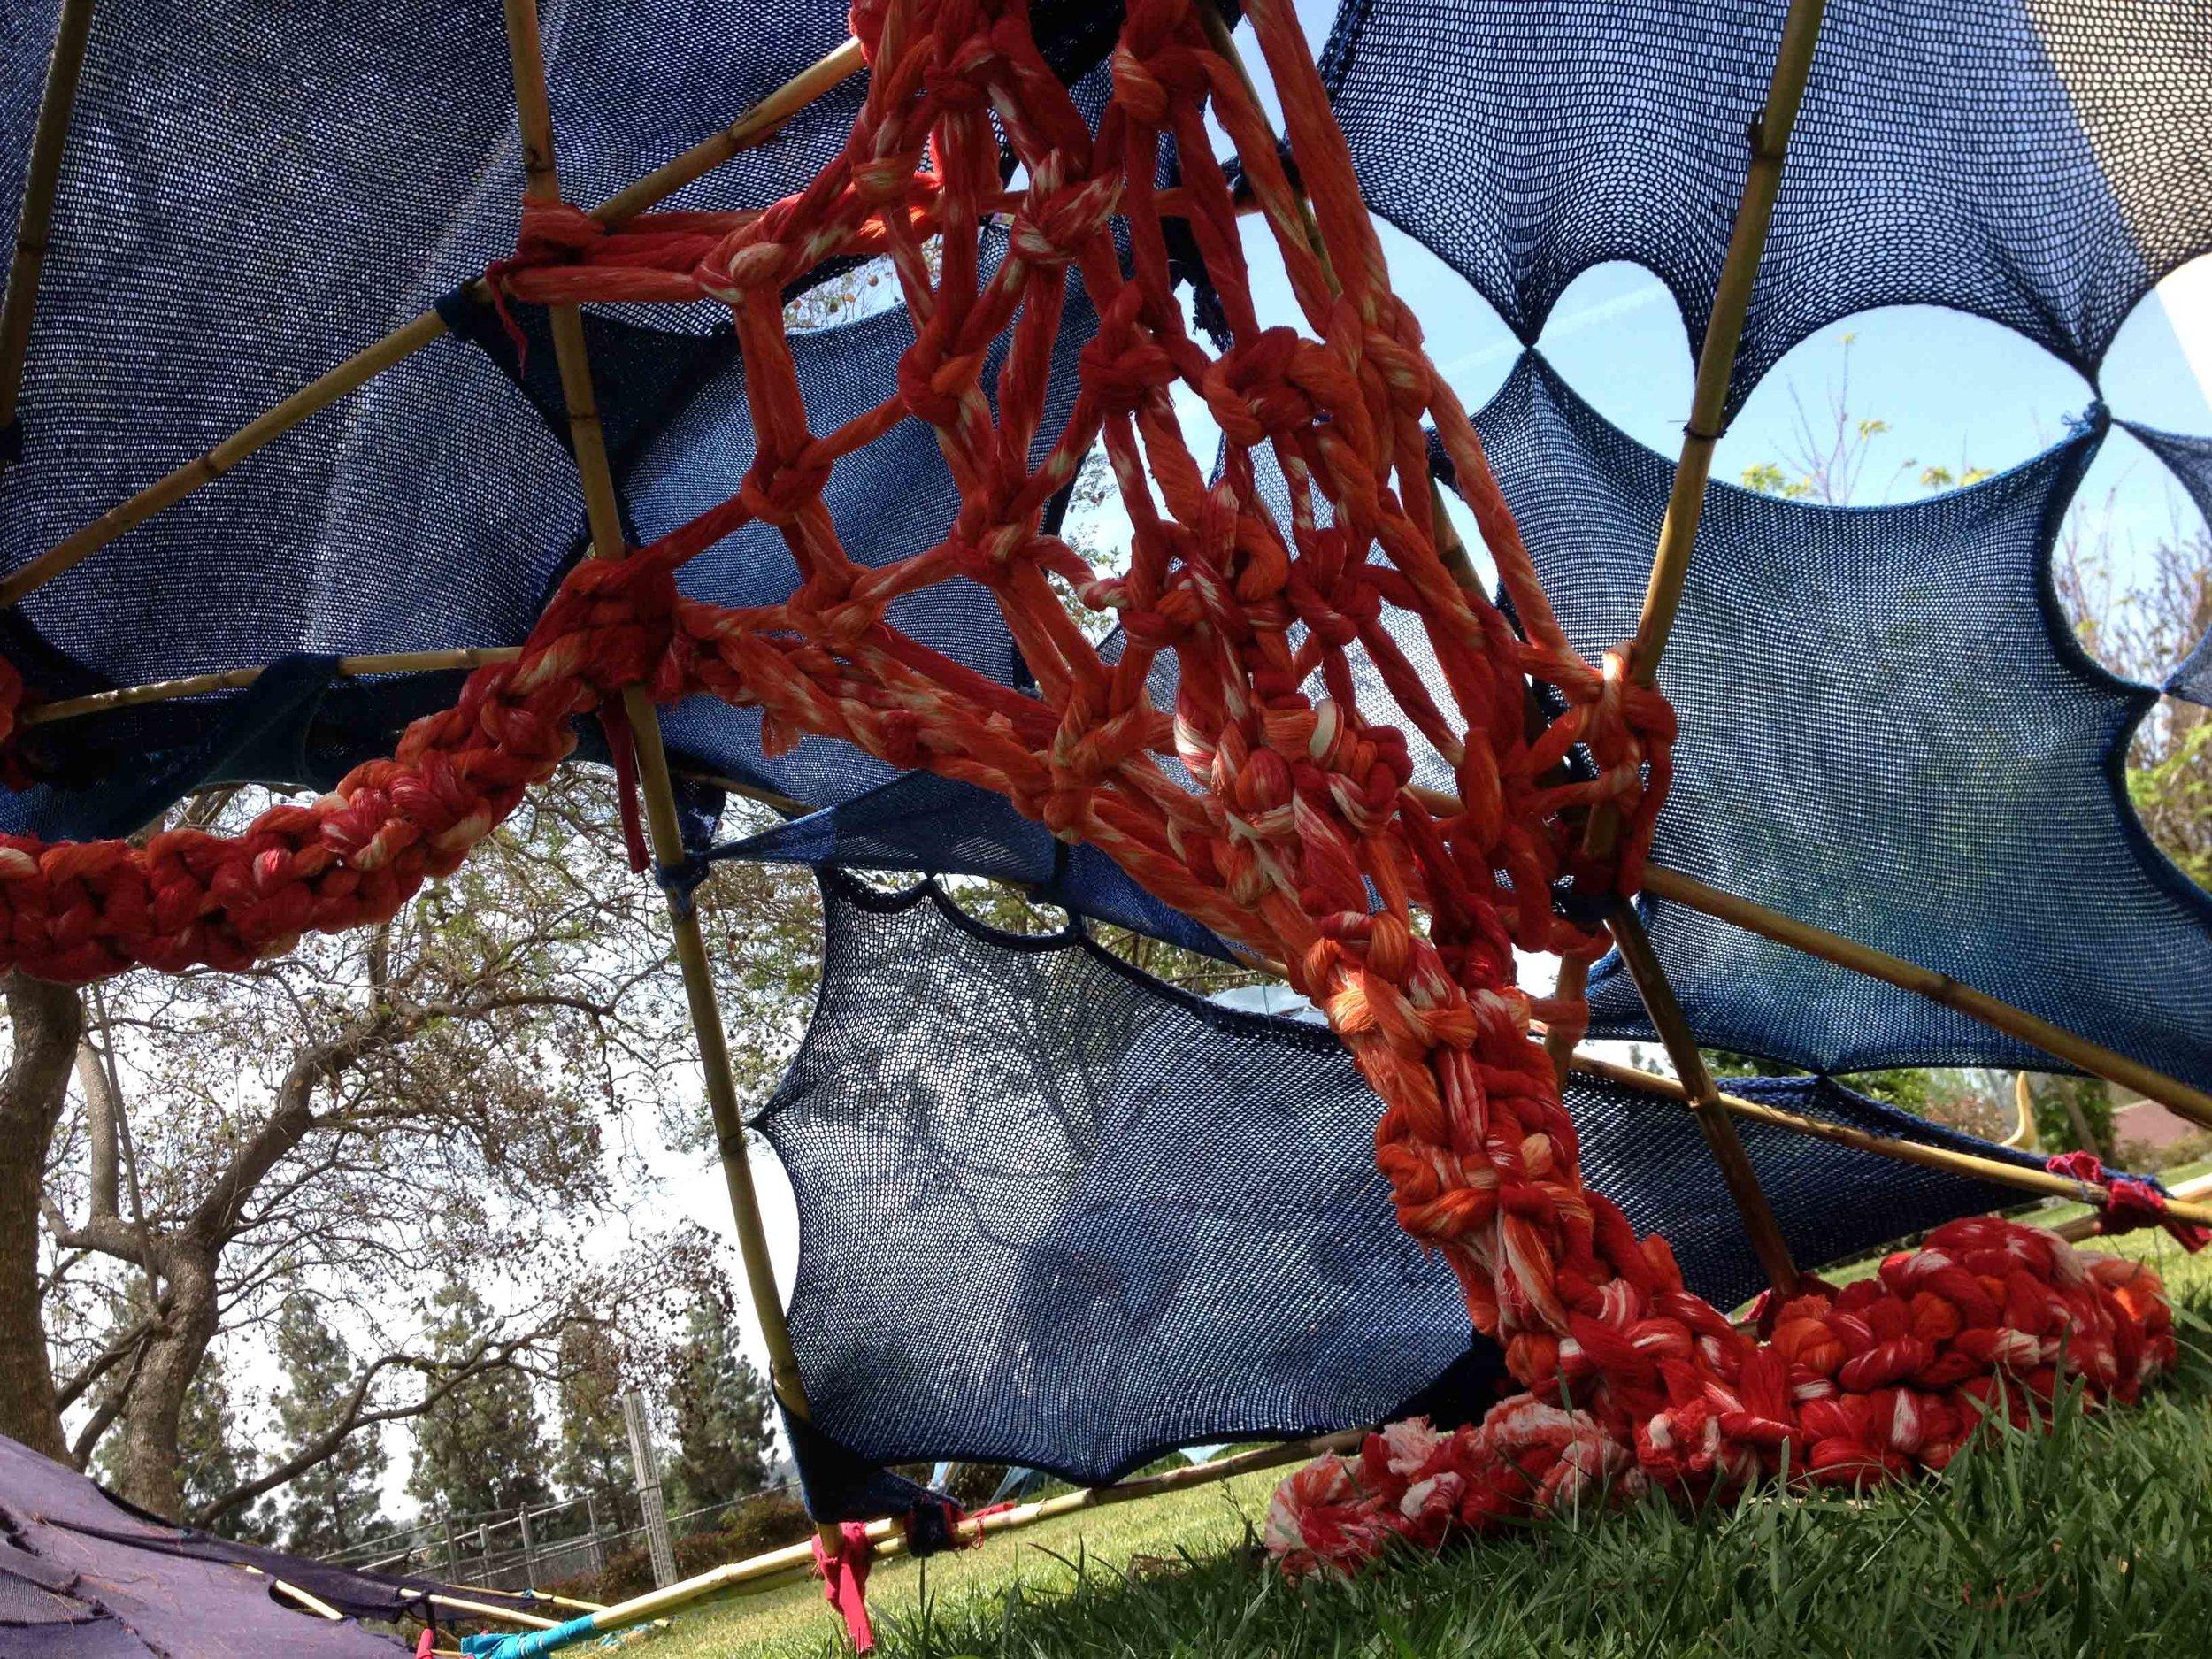 Jacqueline-Surdell-Artist-Installation-Tents-01.jpg